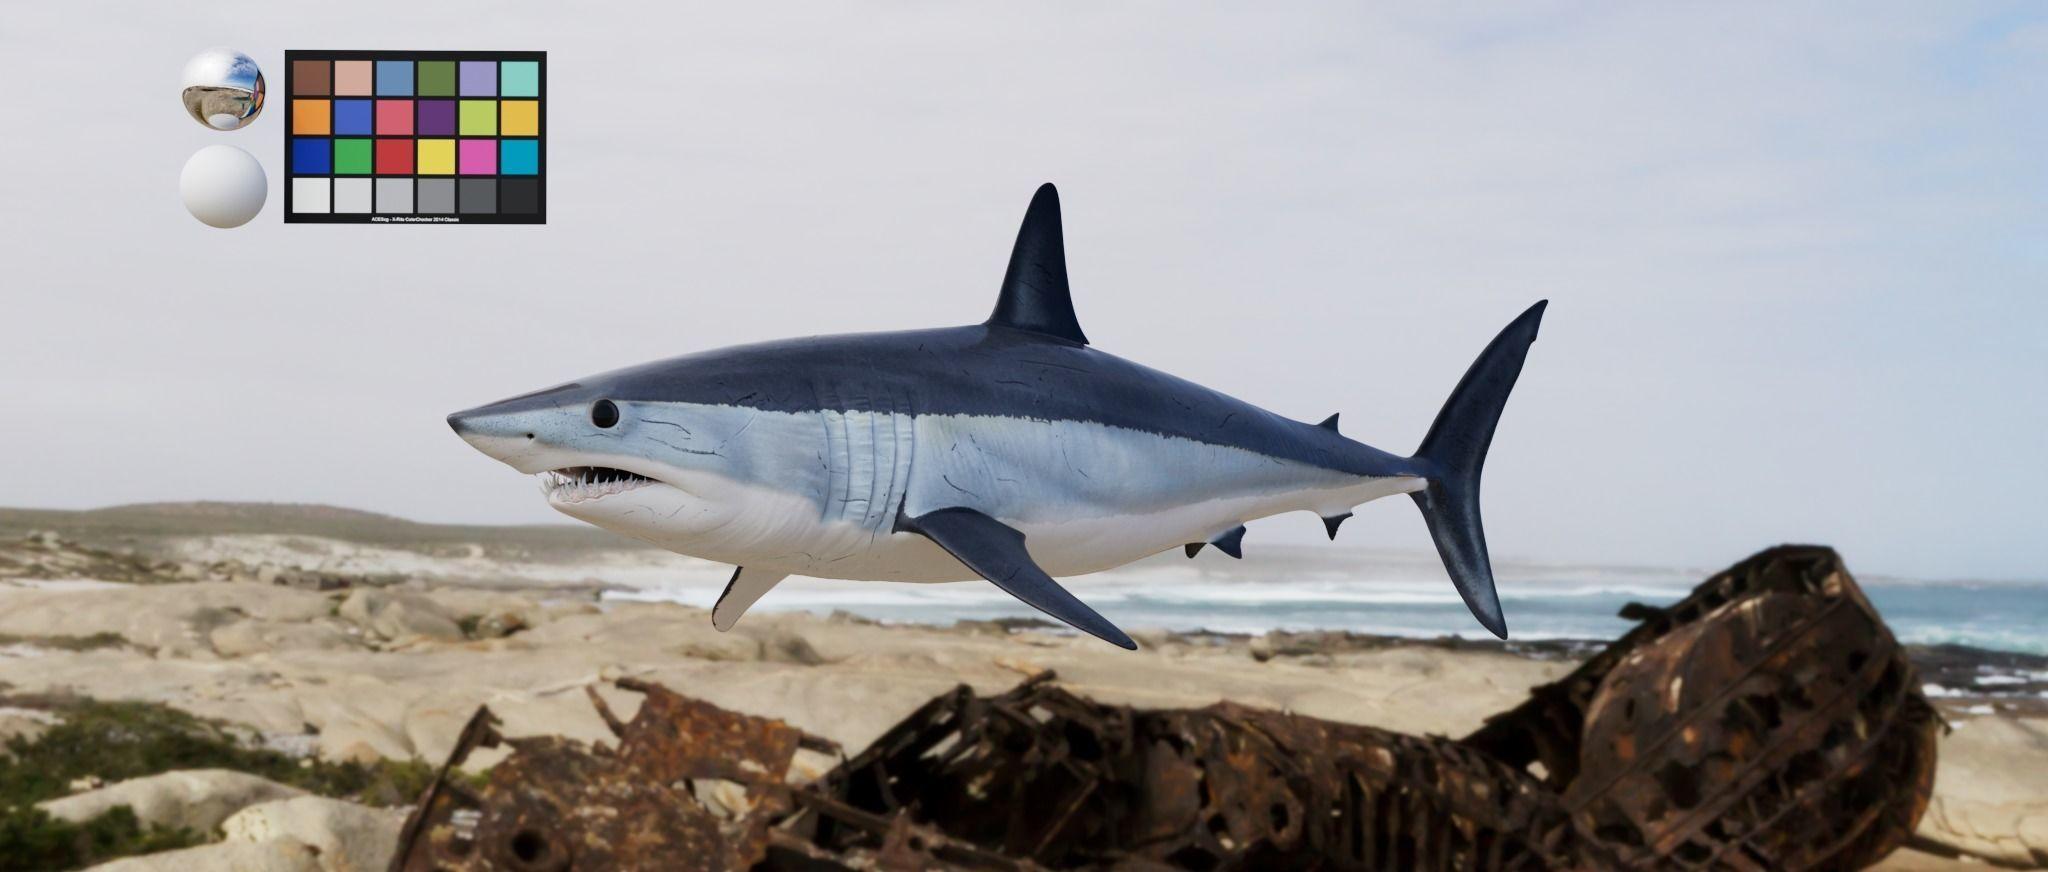 Shark  Mako model with materials